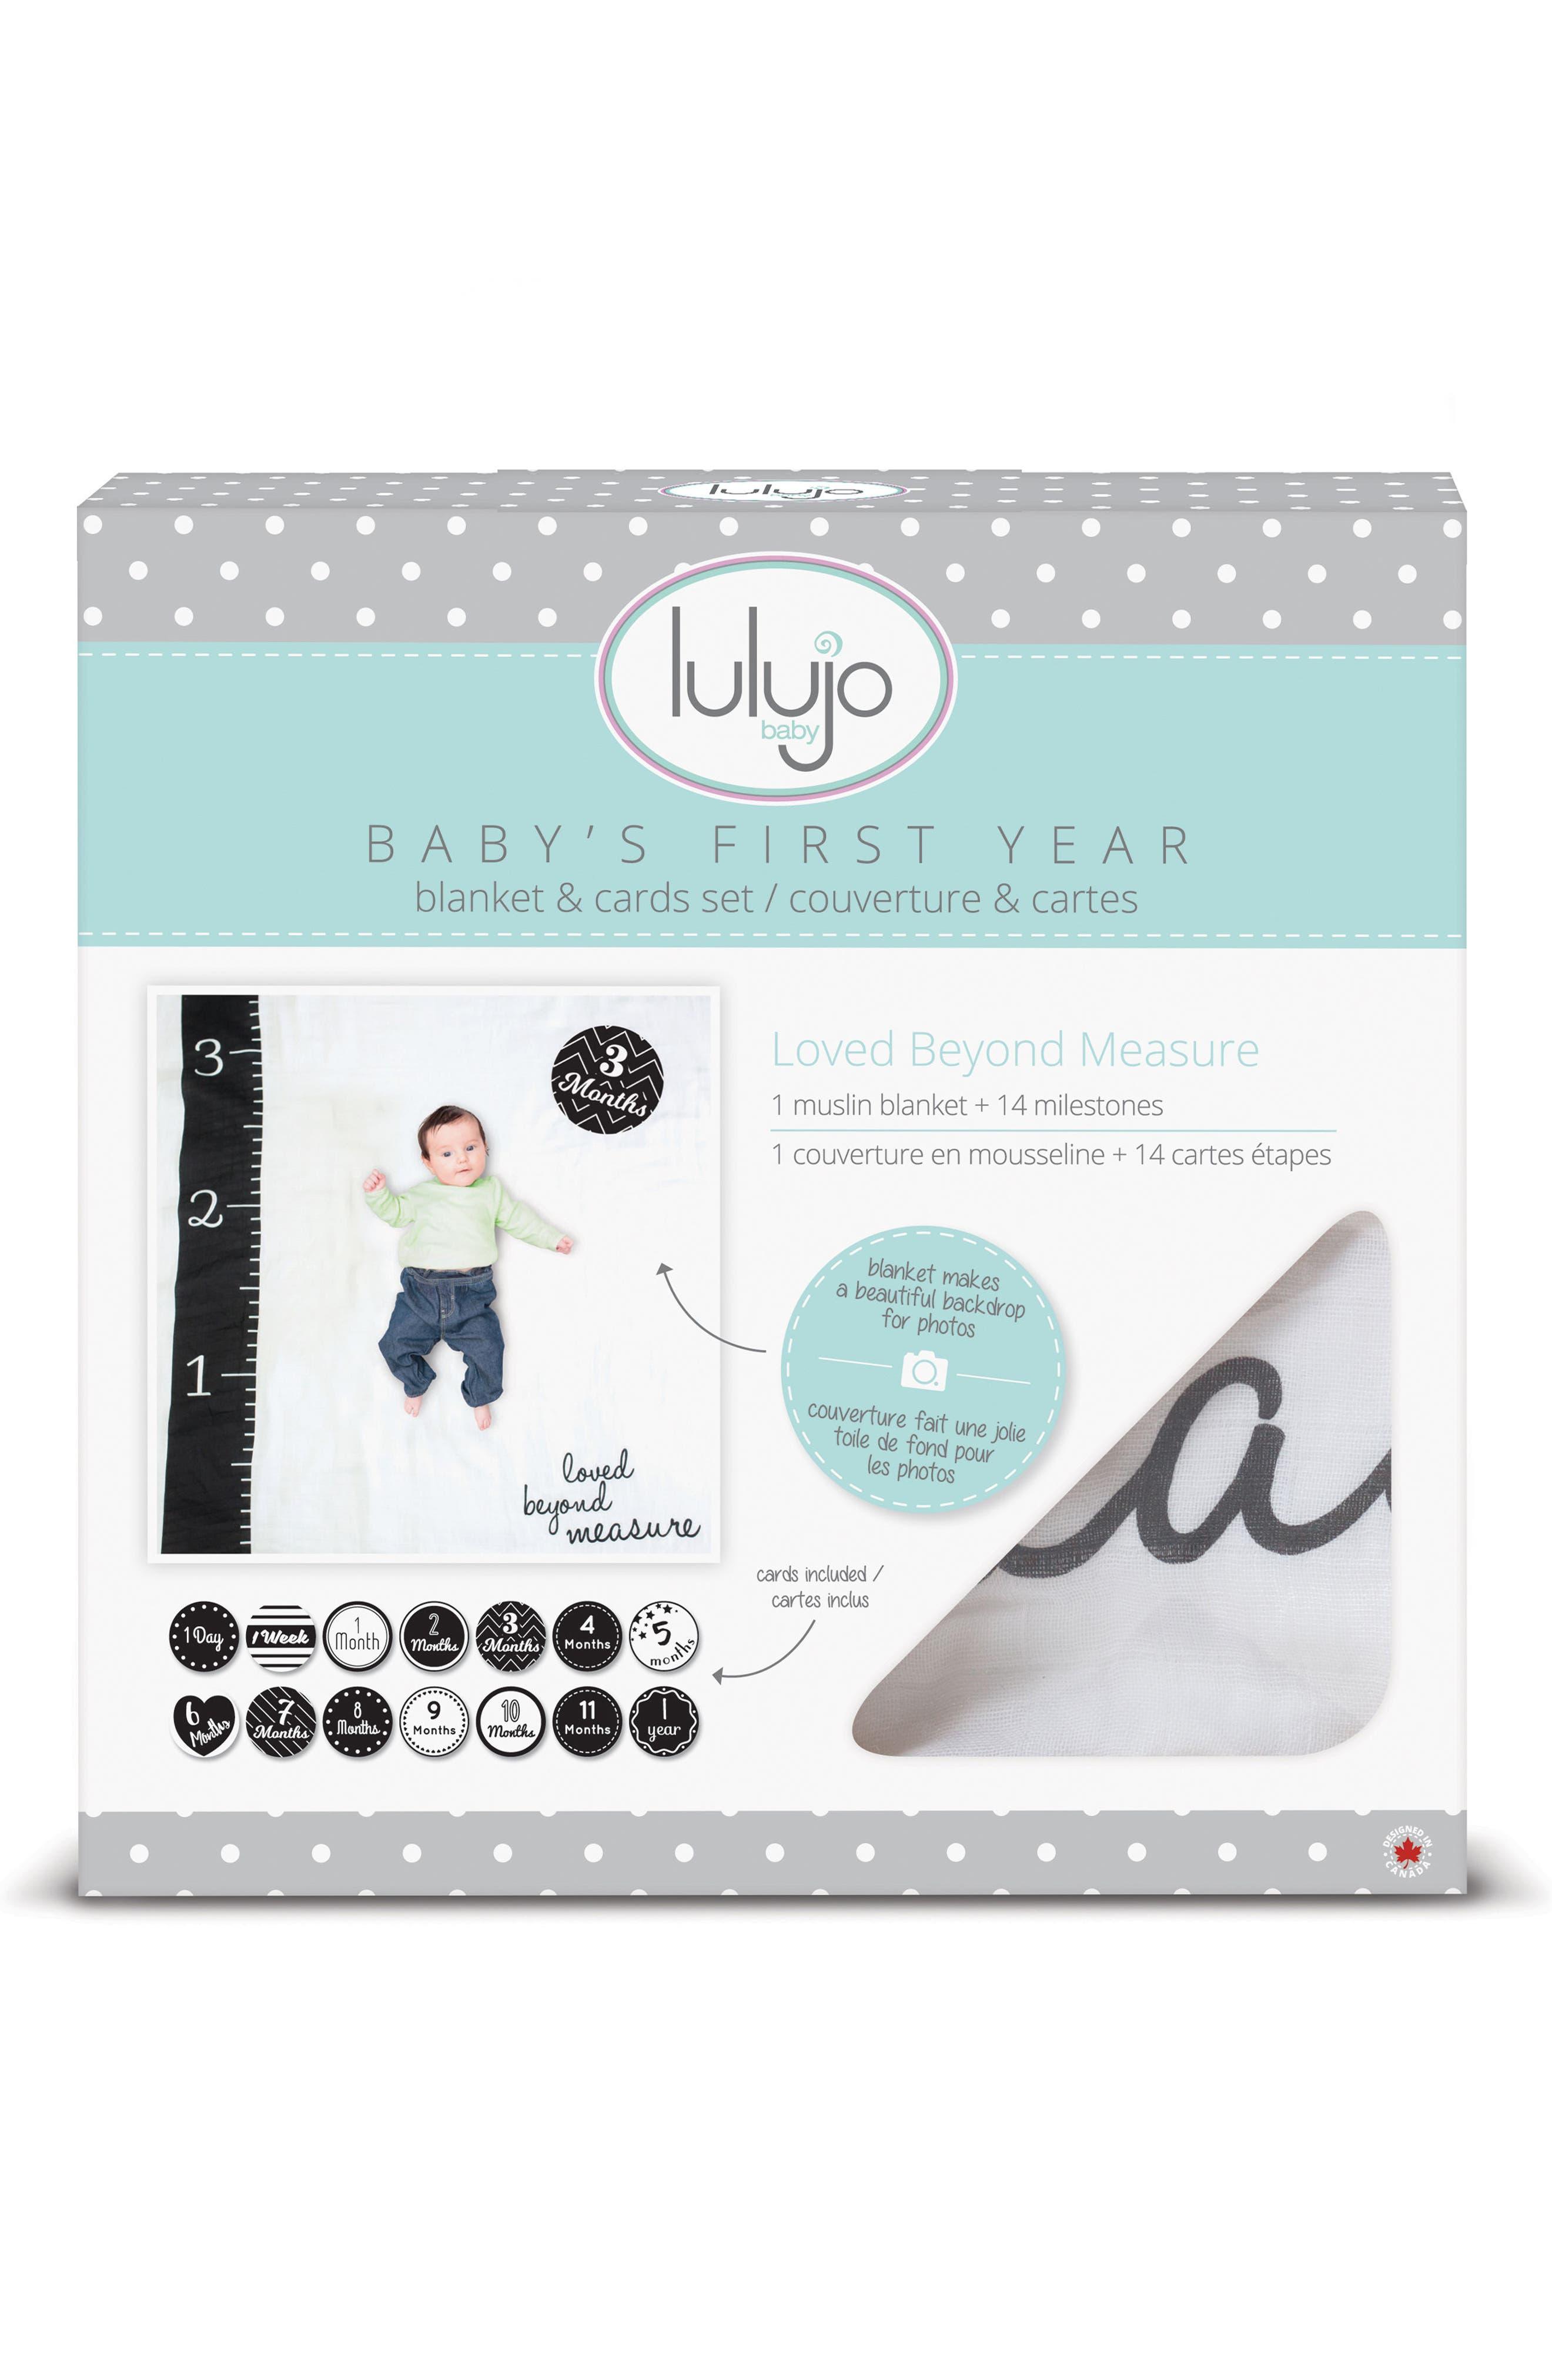 Baby's First Year - Loved Beyond Measure Muslin Blanket & Milestone Card Set,                             Alternate thumbnail 2, color,                             100